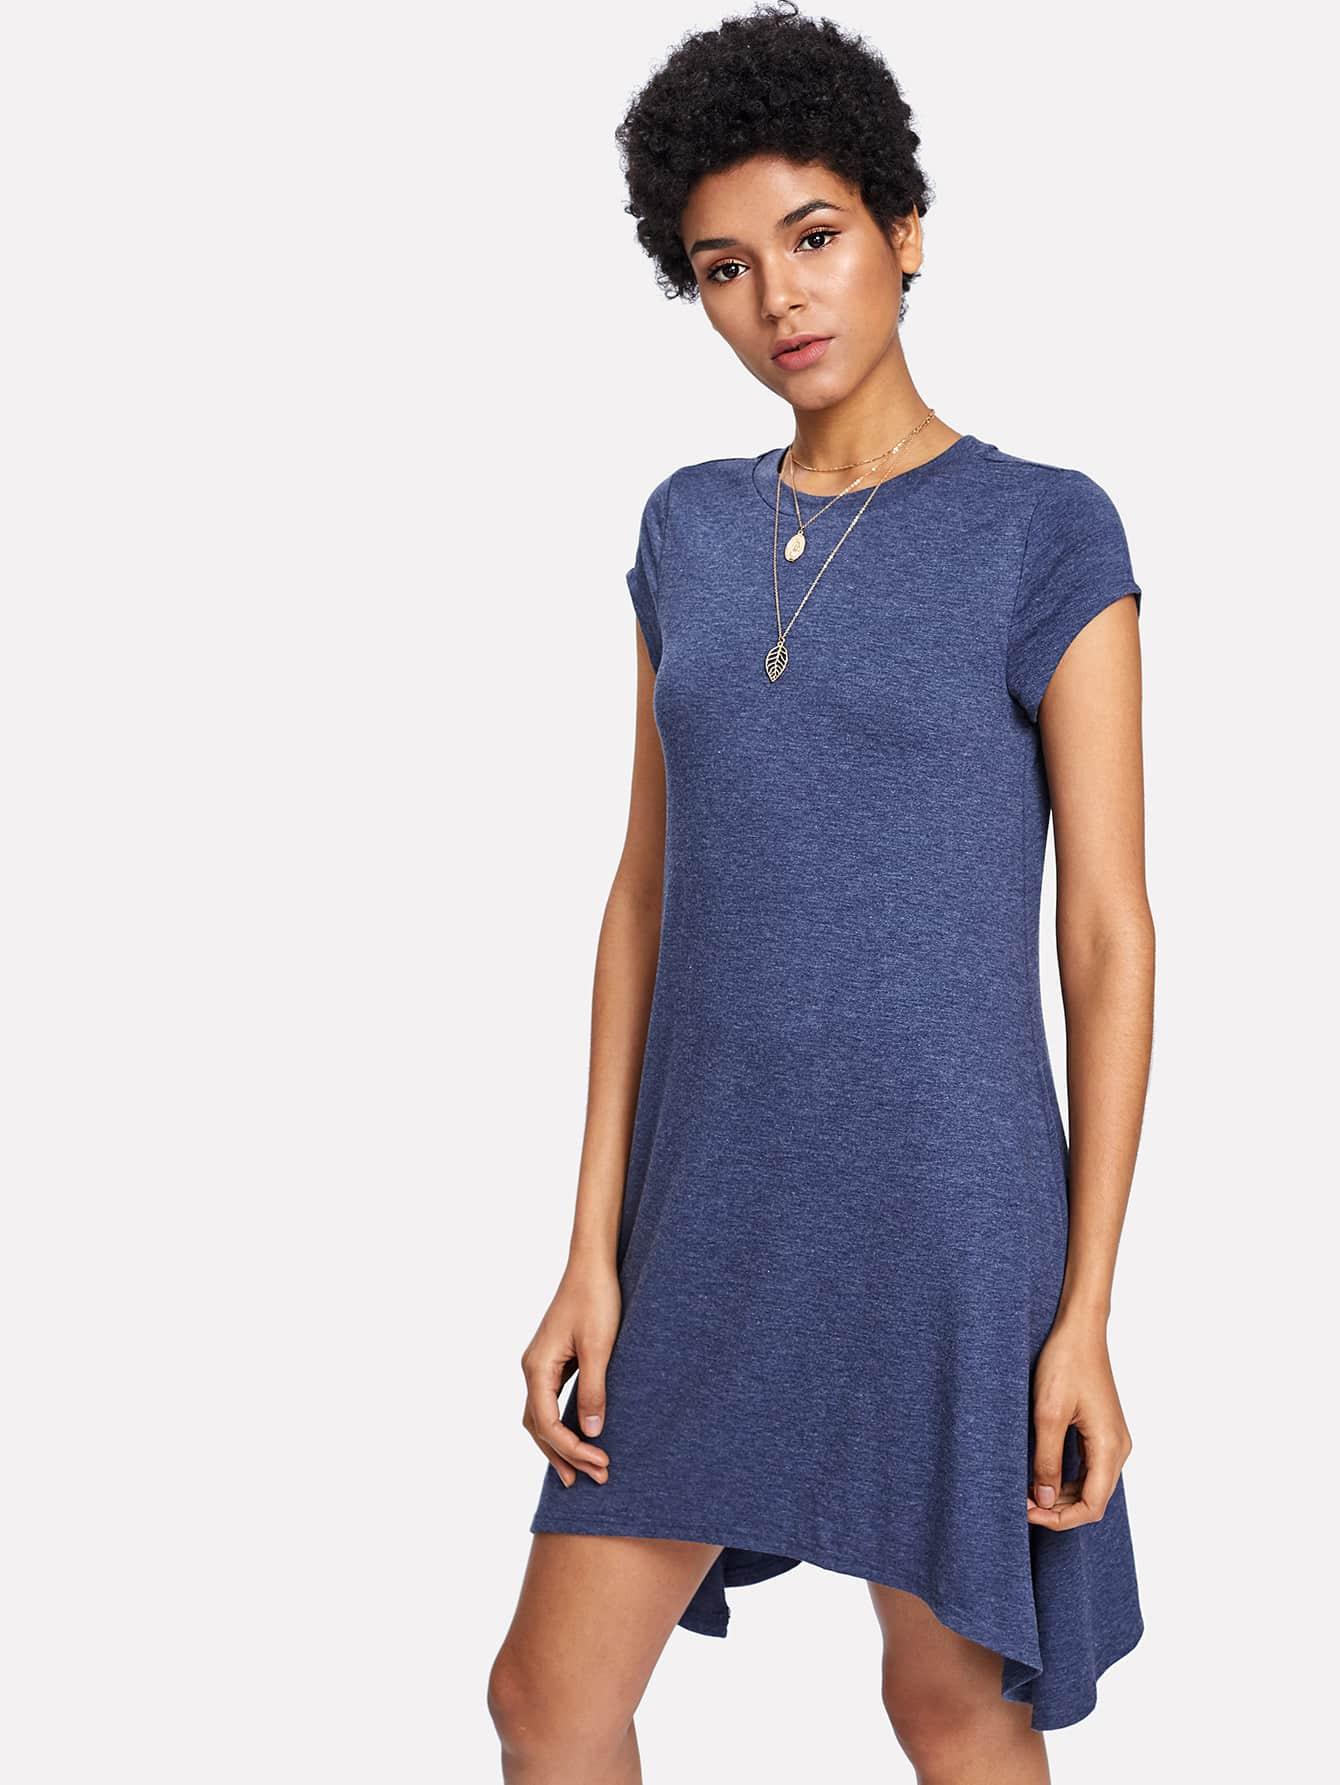 Asymmetric Hem Shift Dress lace design asymmetric hem dress